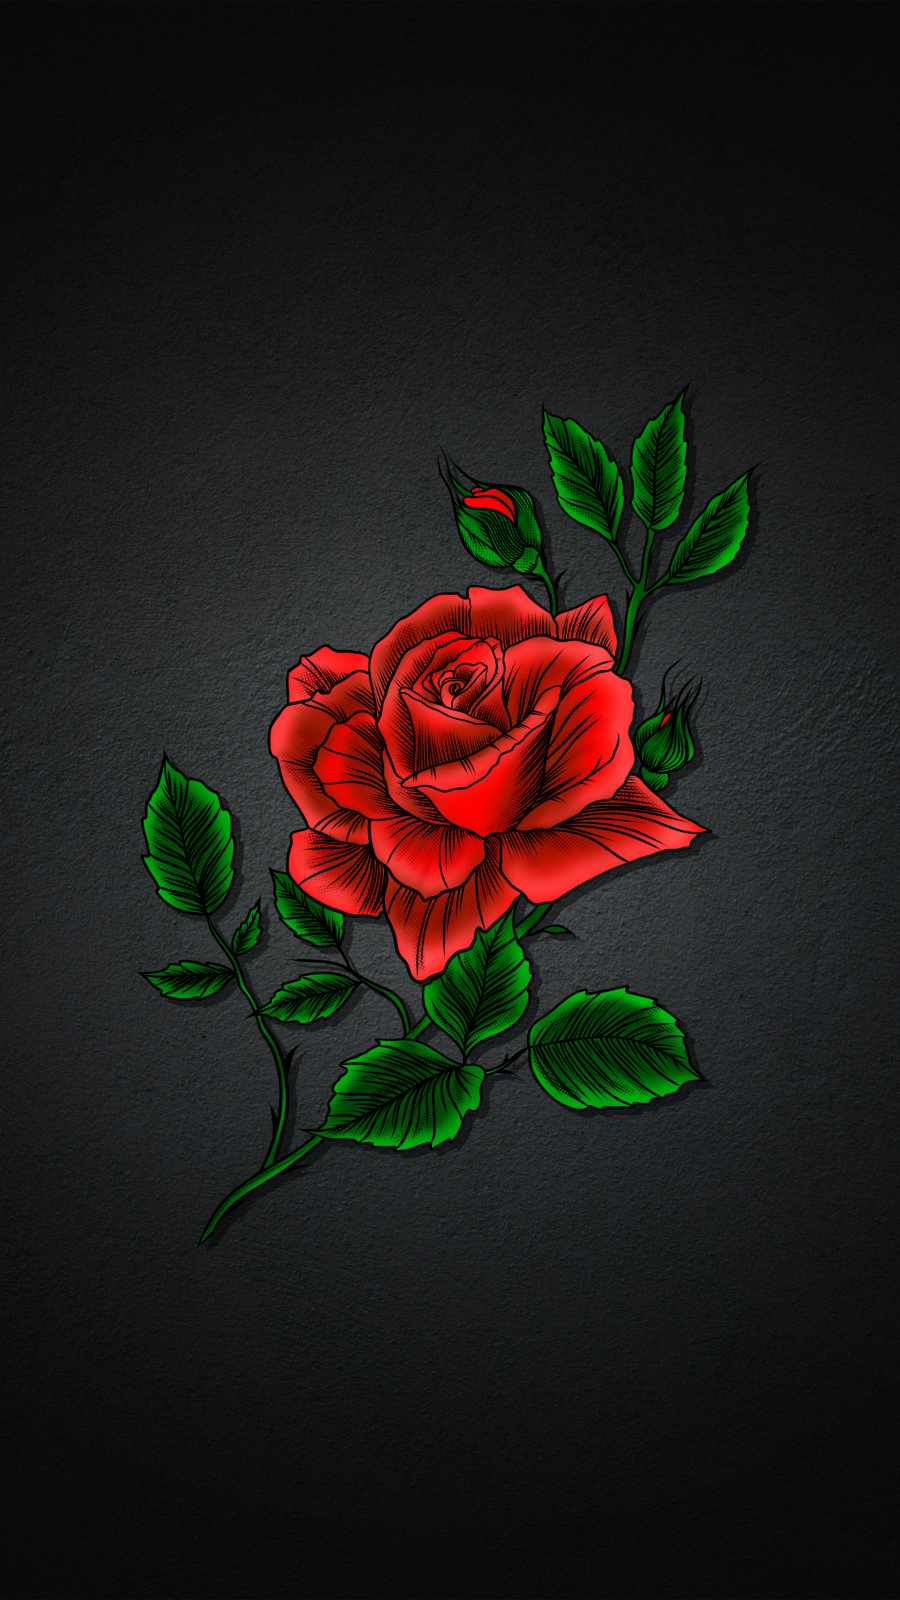 Red Rose iPhone Wallpaper